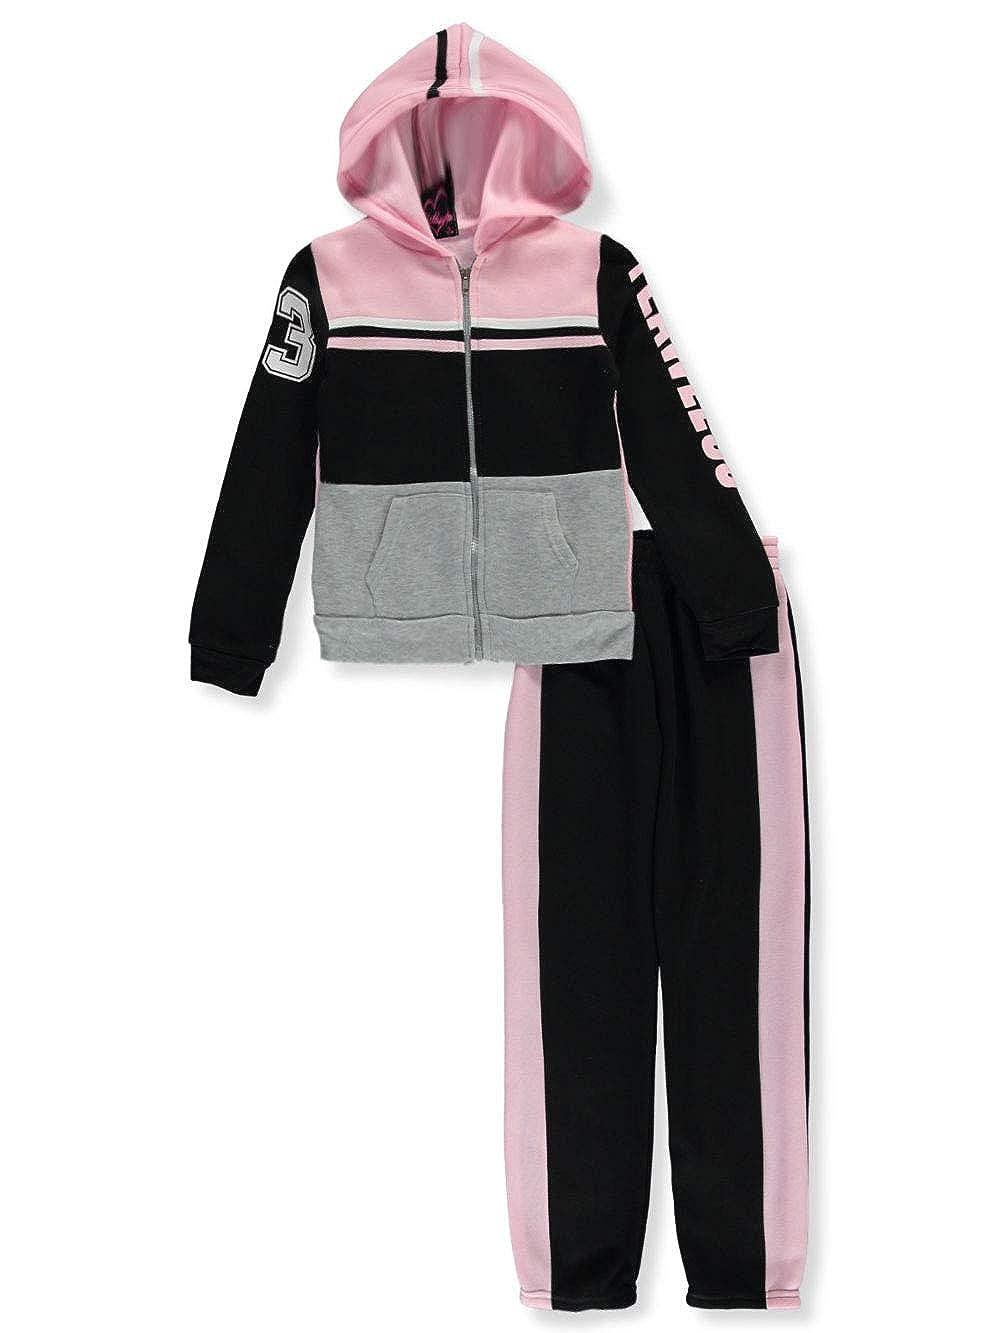 Chillipop Girls Flawless 2-Piece Sweatsuit Pants Set